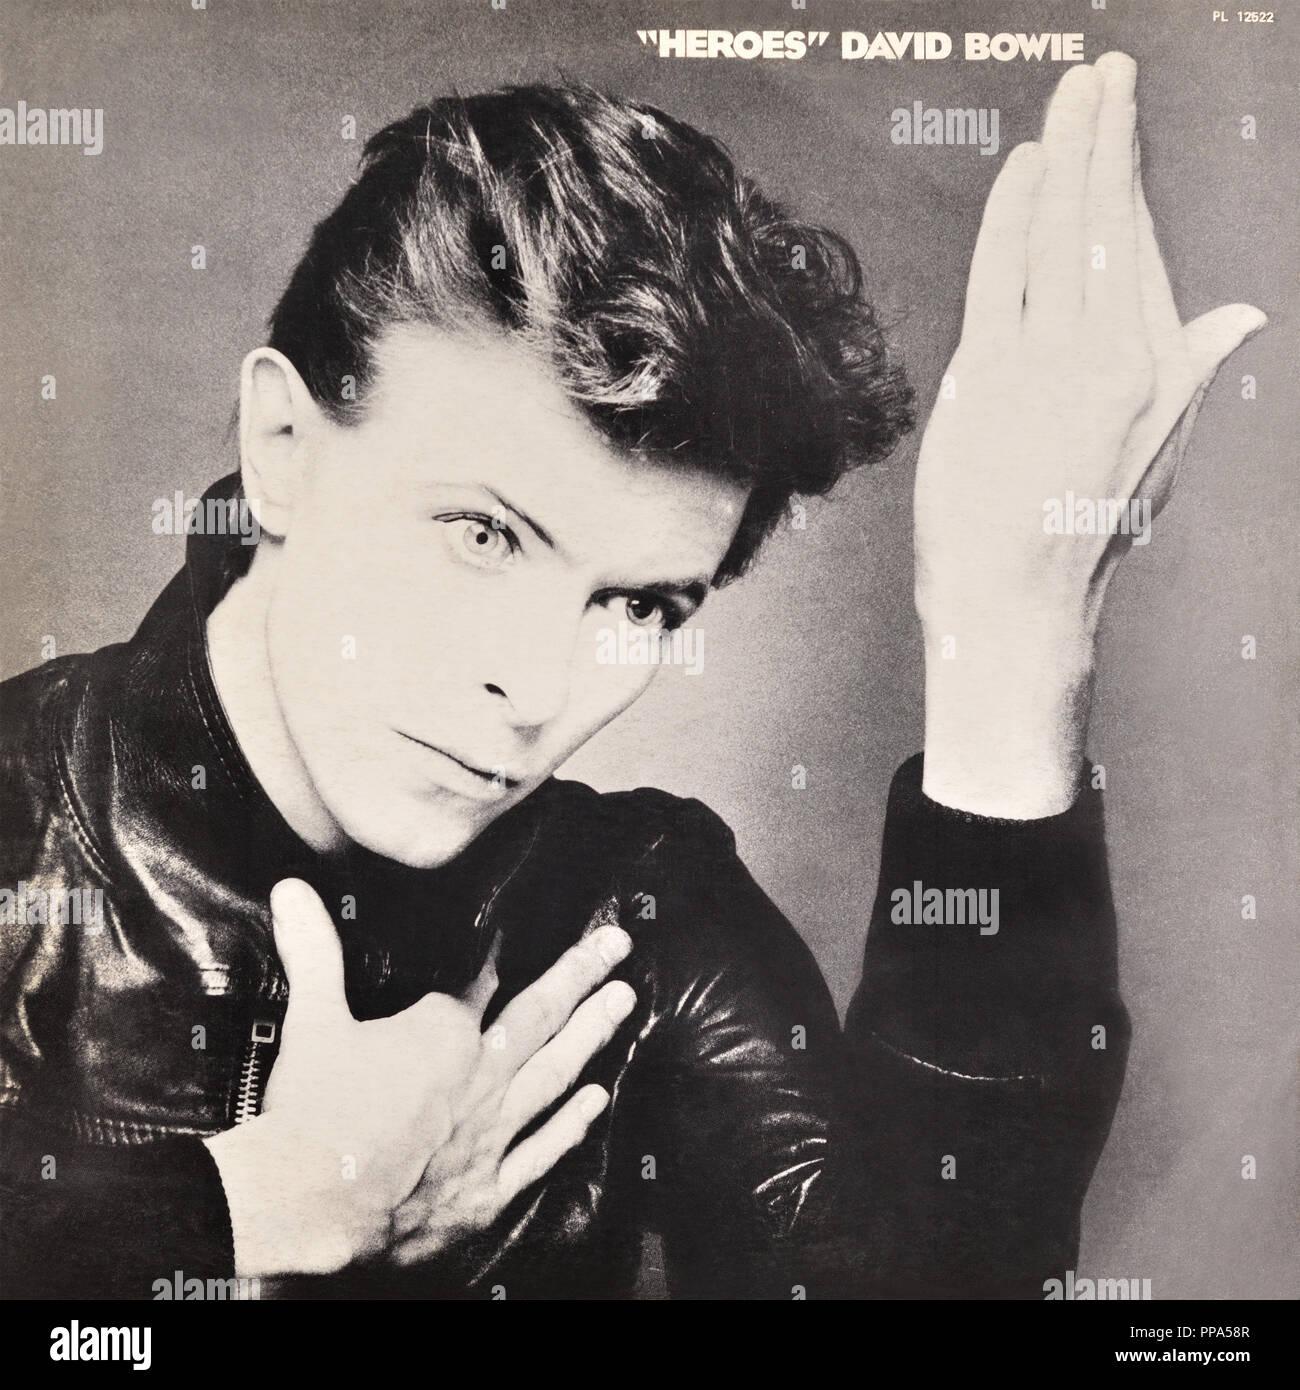 David Bowie original vinyl album cover - Heroes - 1977 Stock Photo